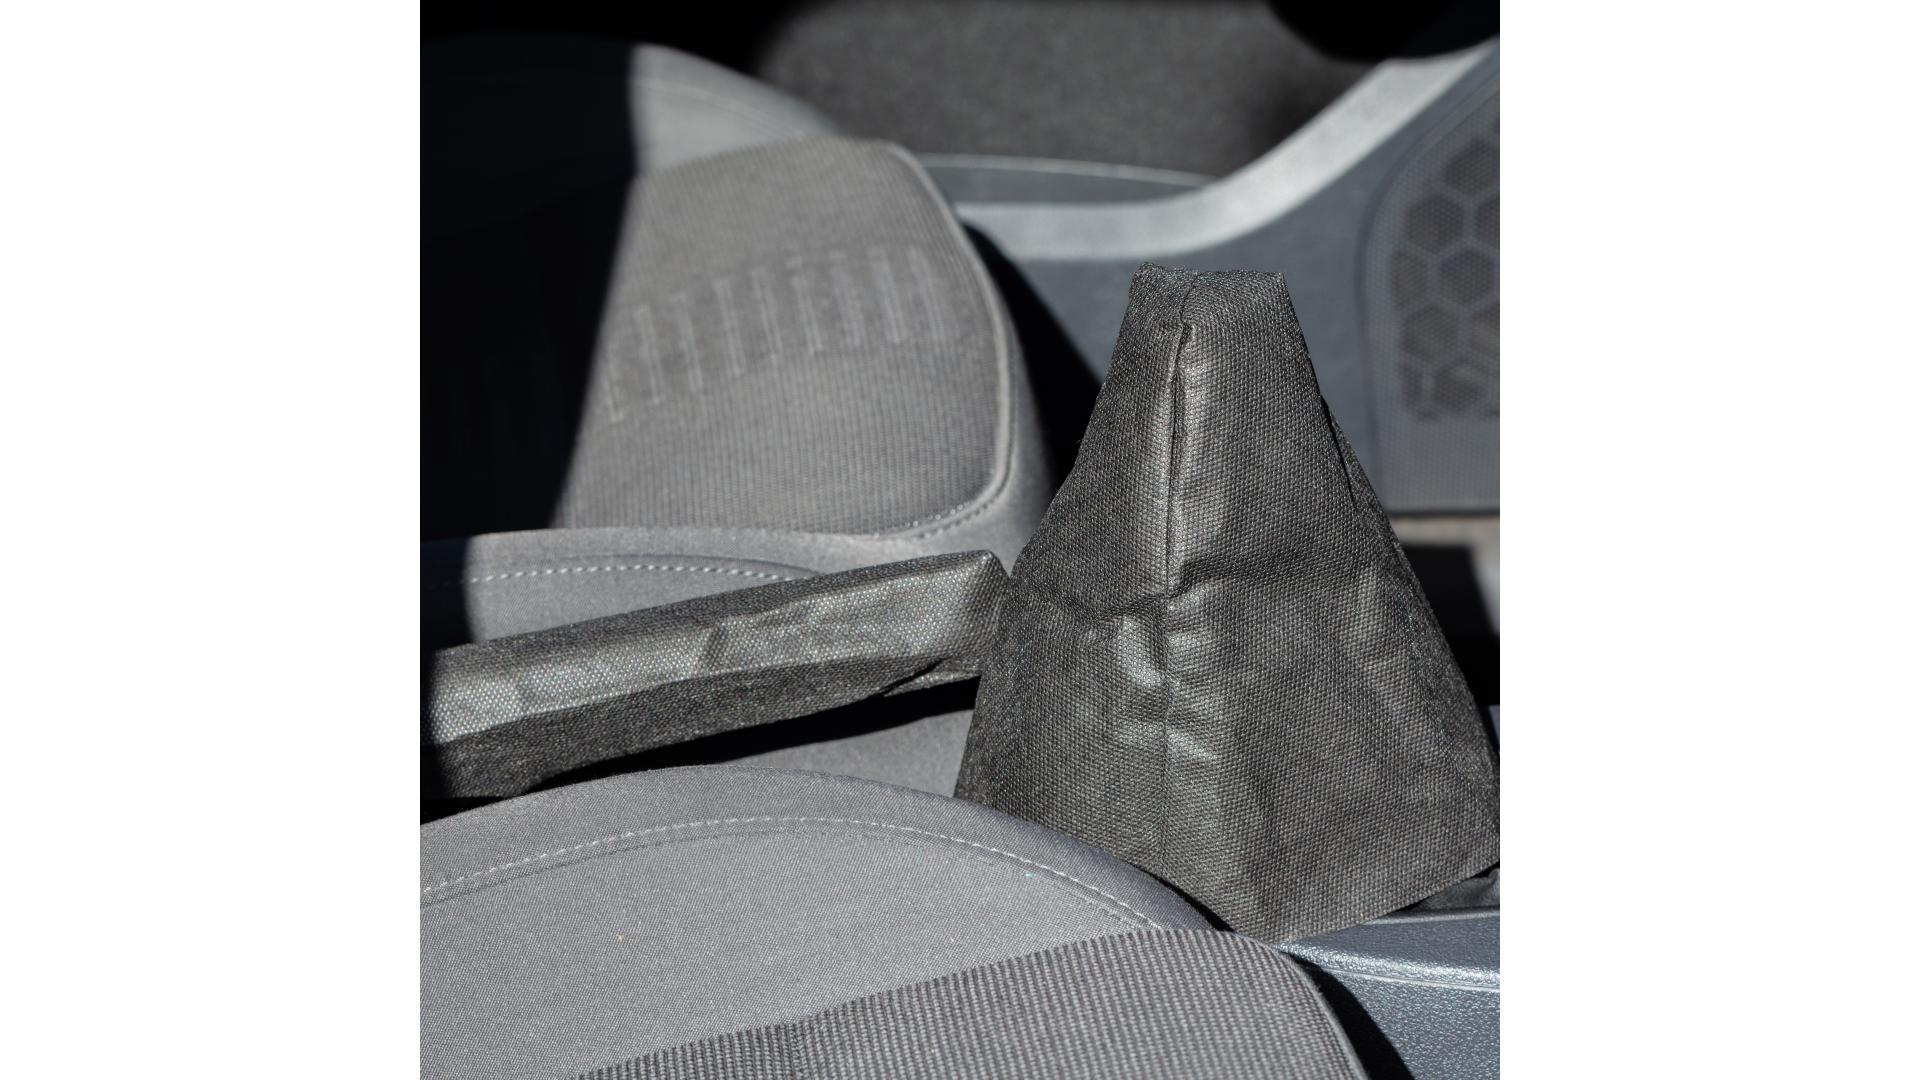 4CARS sada ochranných potahov (volant, řidící páka, ruční brzda)